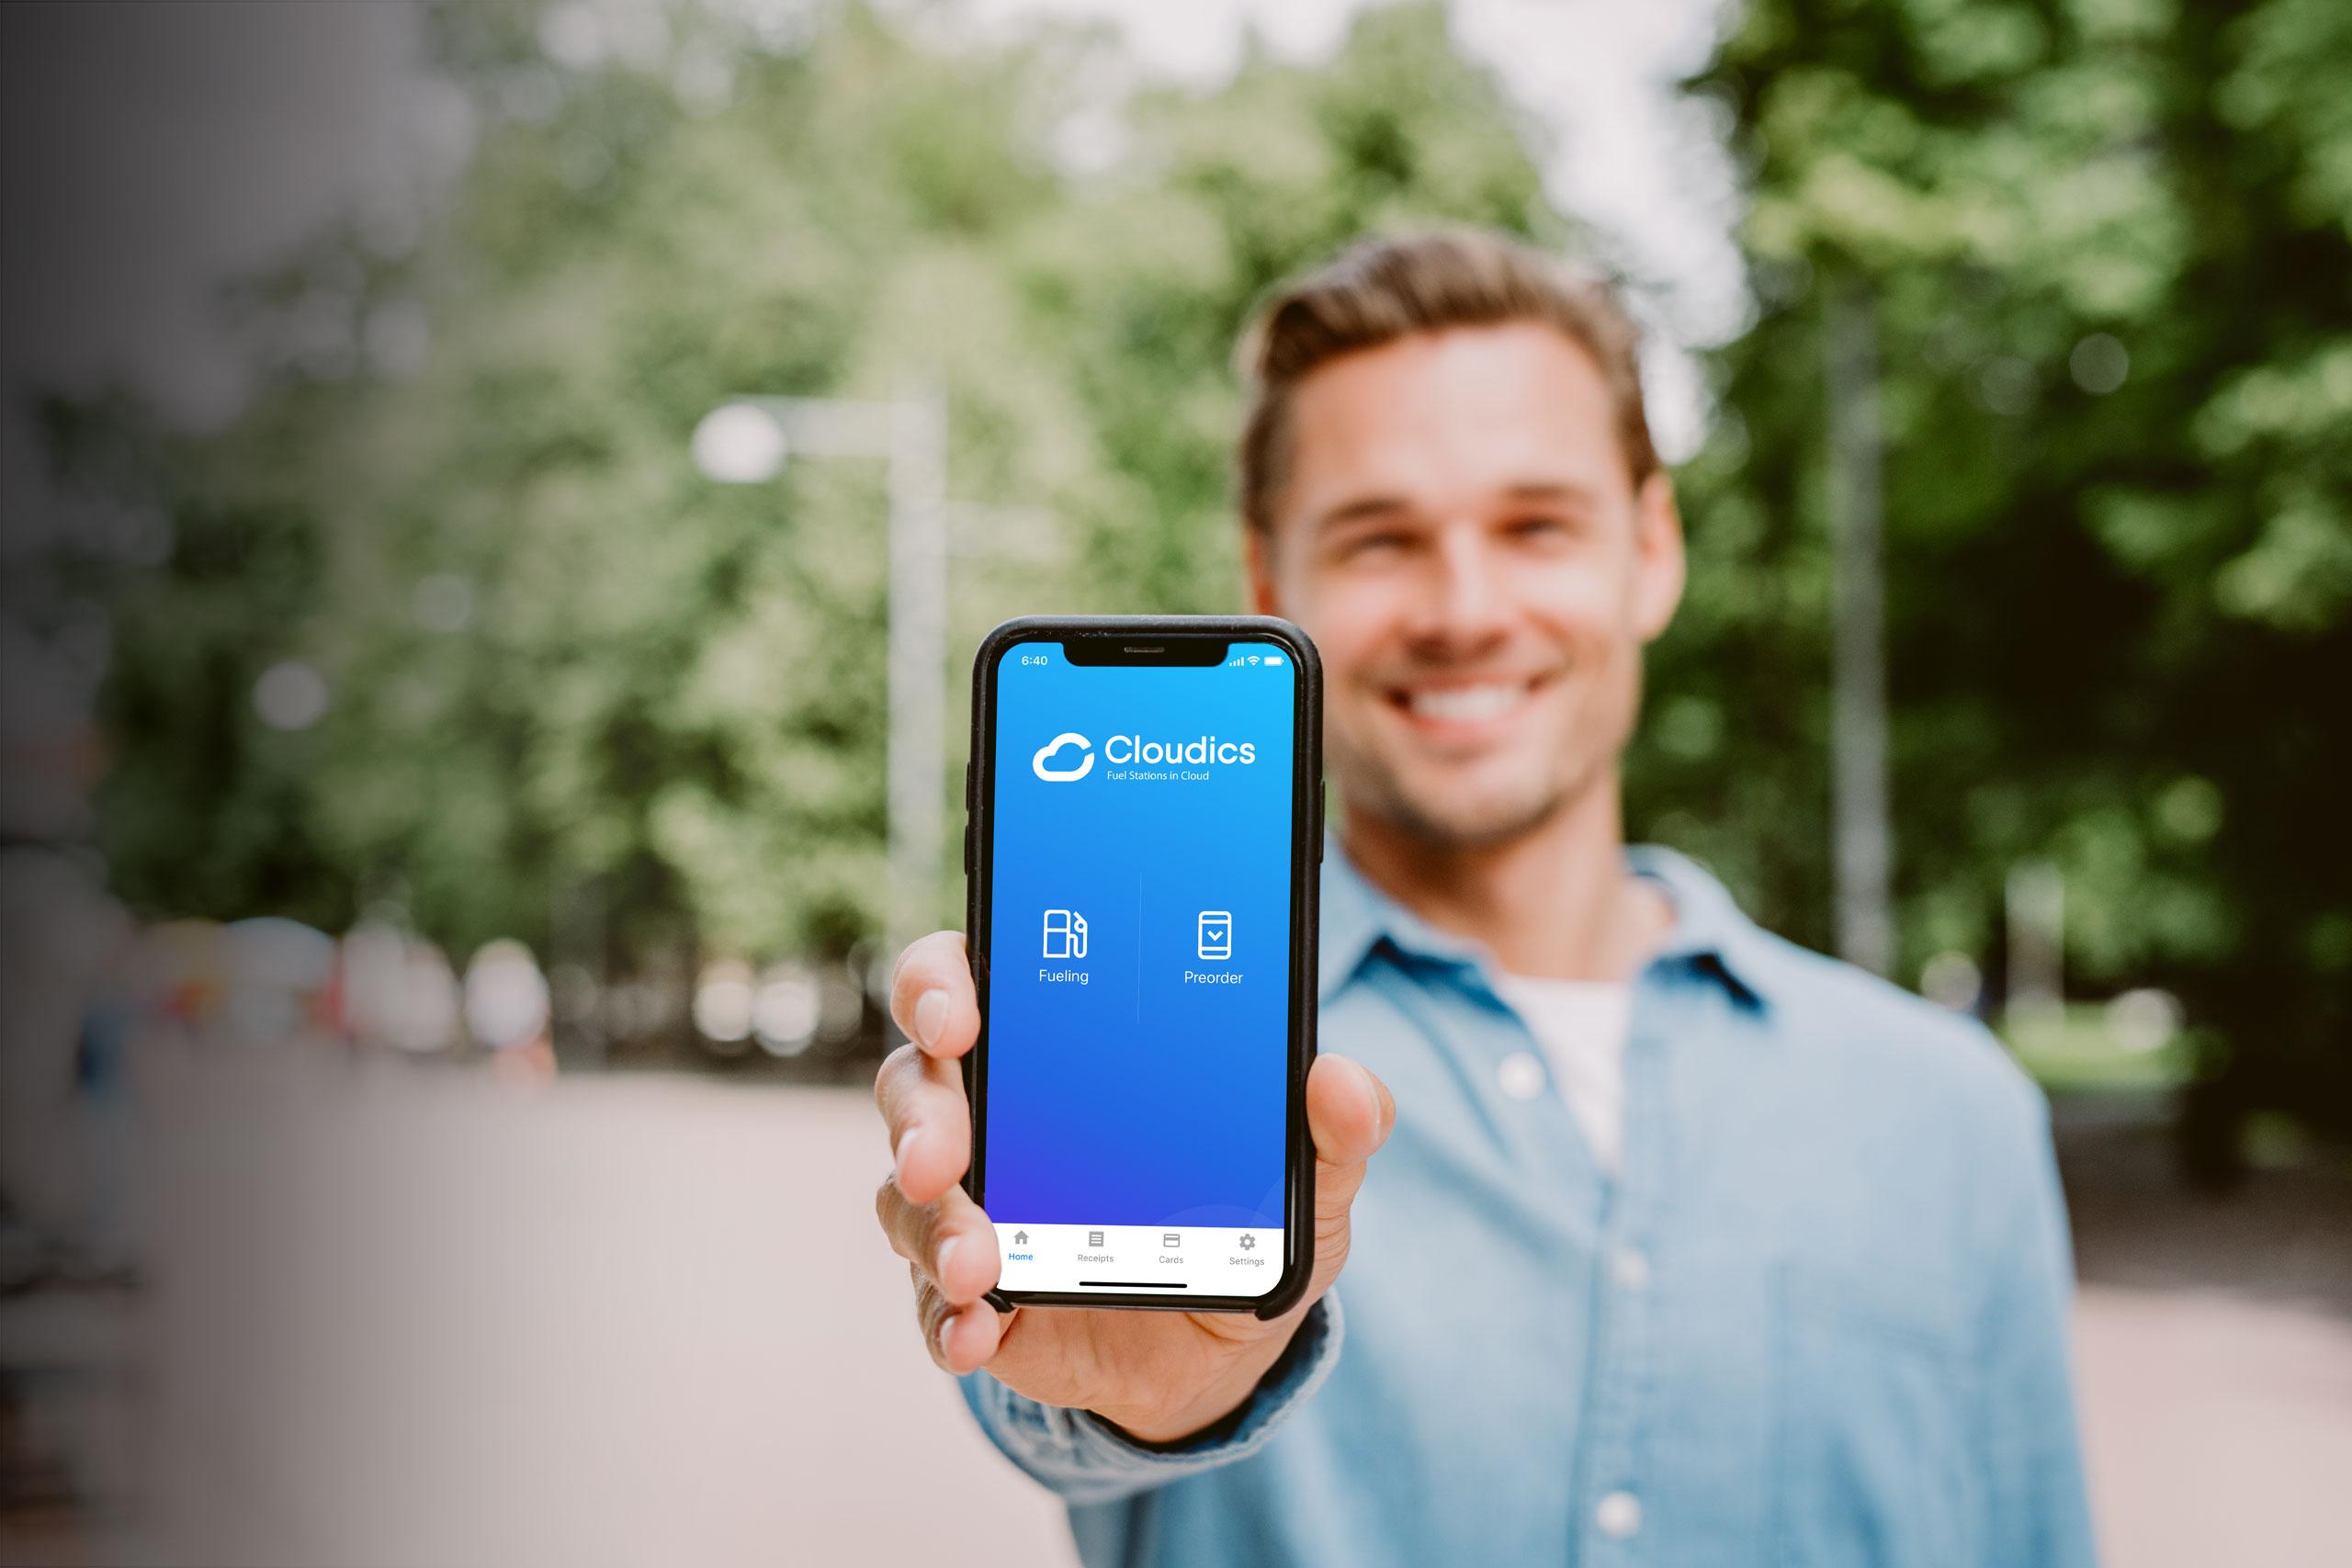 cloudics mobile payment application